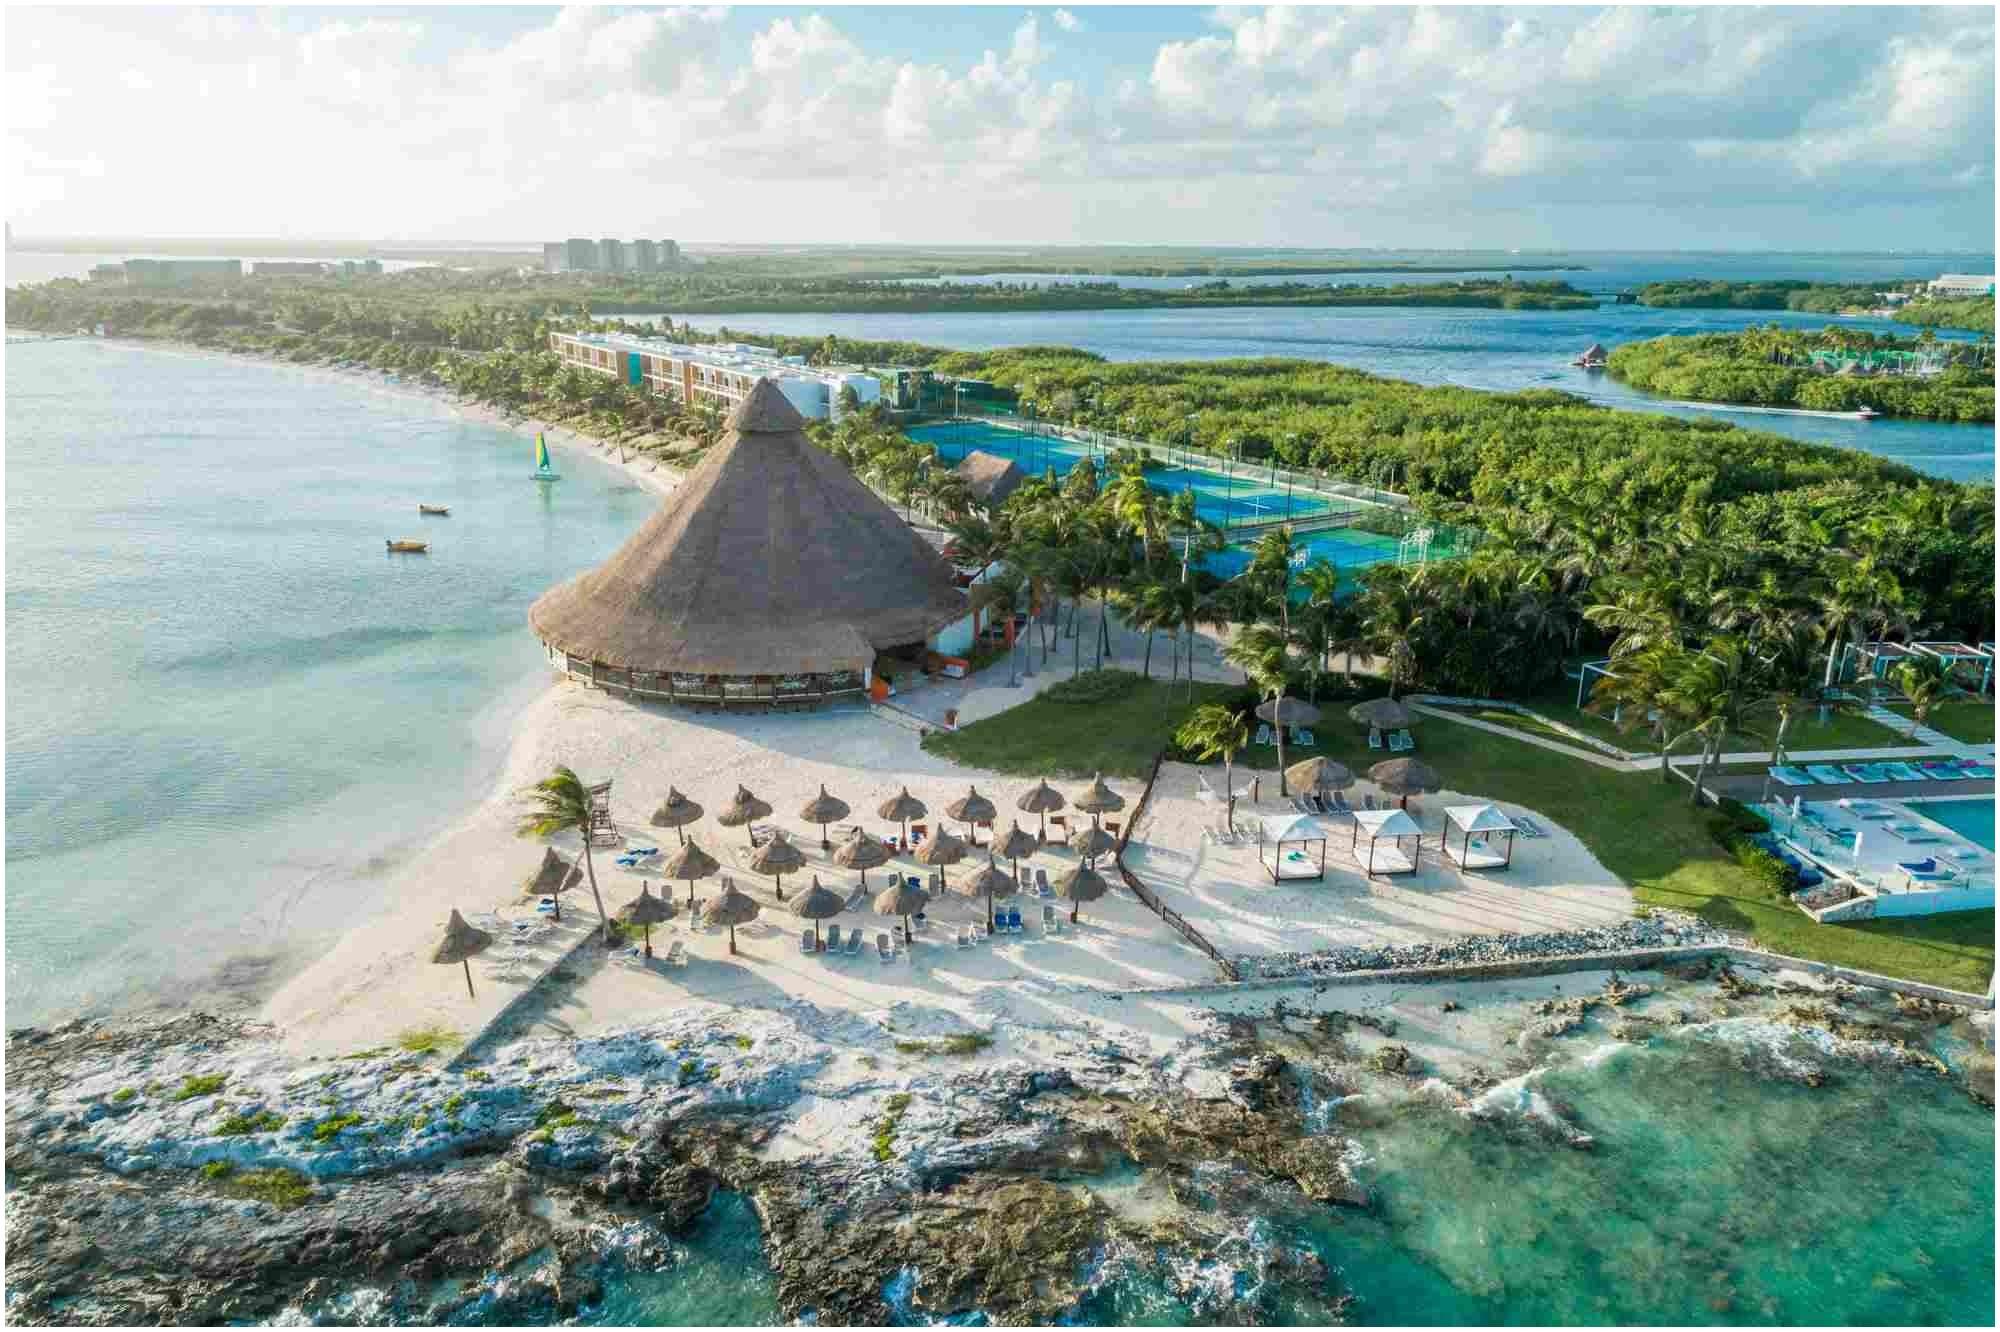 Best Italian Beach Resort for Families